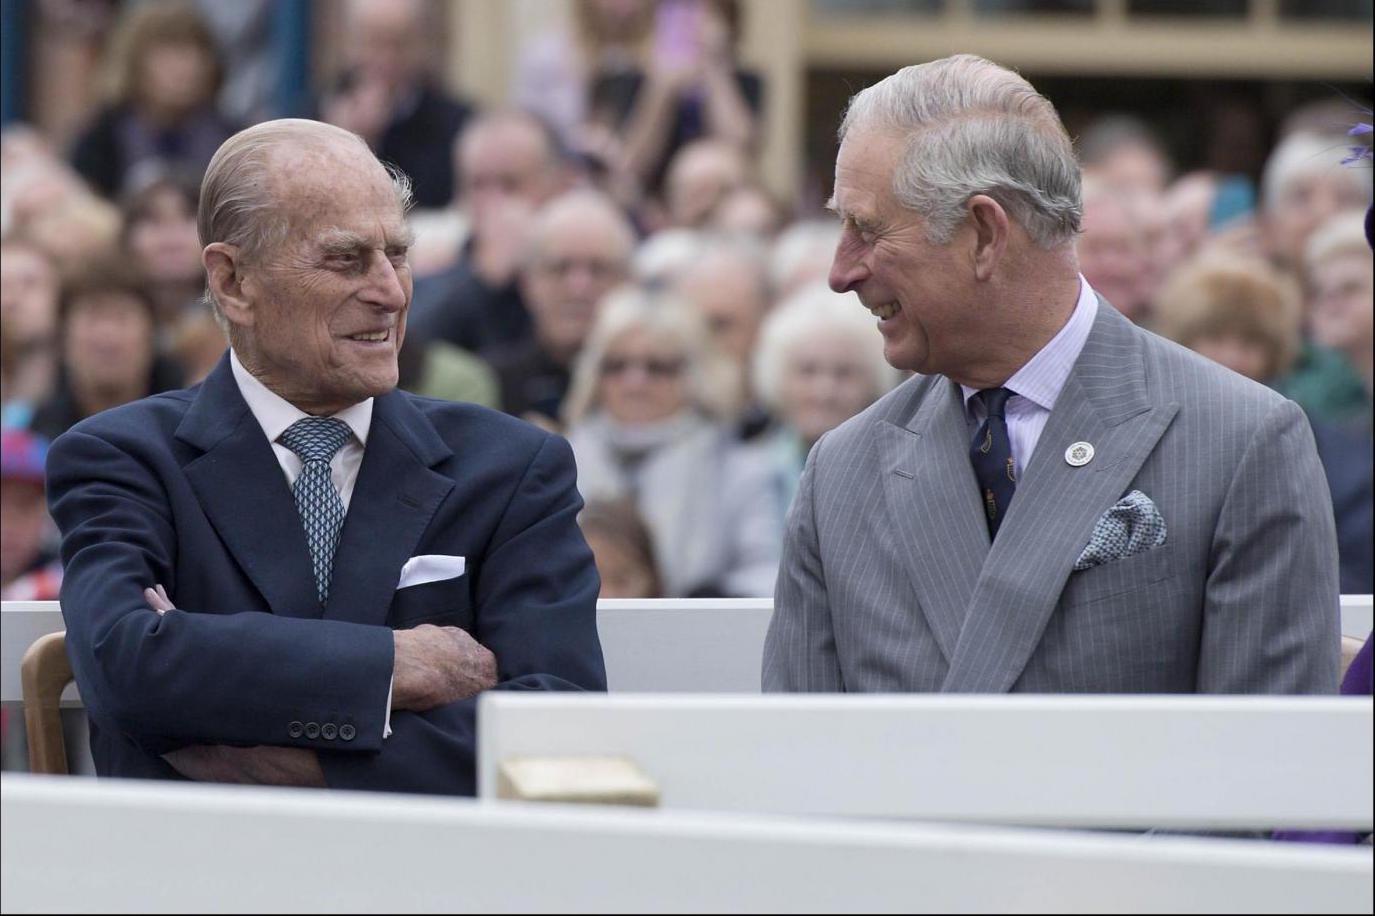 Buckingham Palace, Filippo si ritira